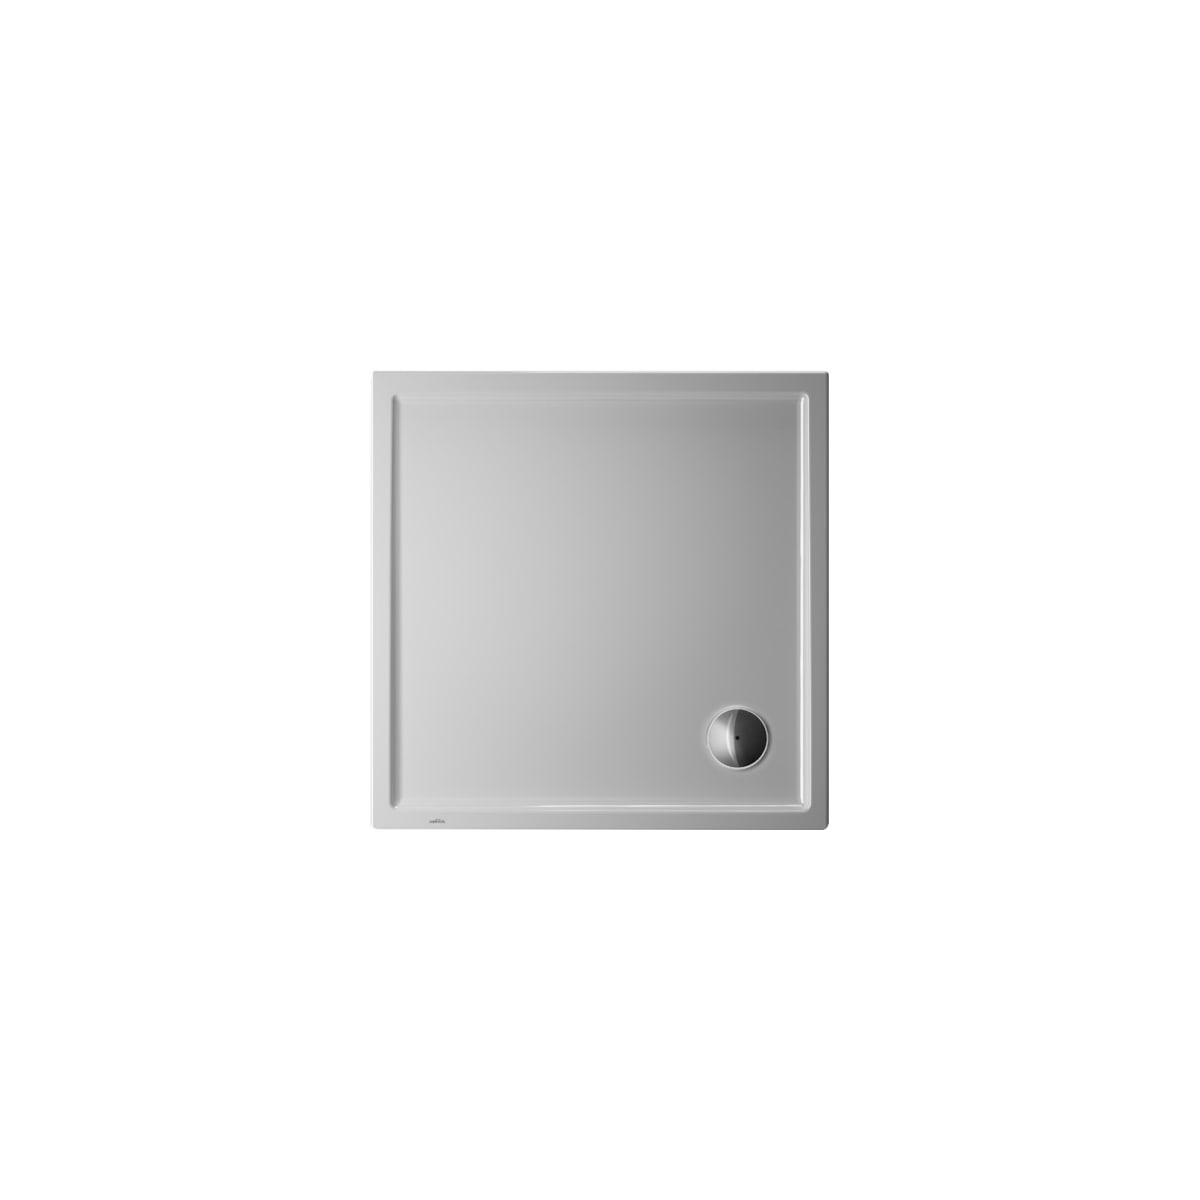 "Duravit Starck 39-3/8"" x 39-3/8"" Shower Base with Single Threshold and 3-1/2"" Corner Drain"